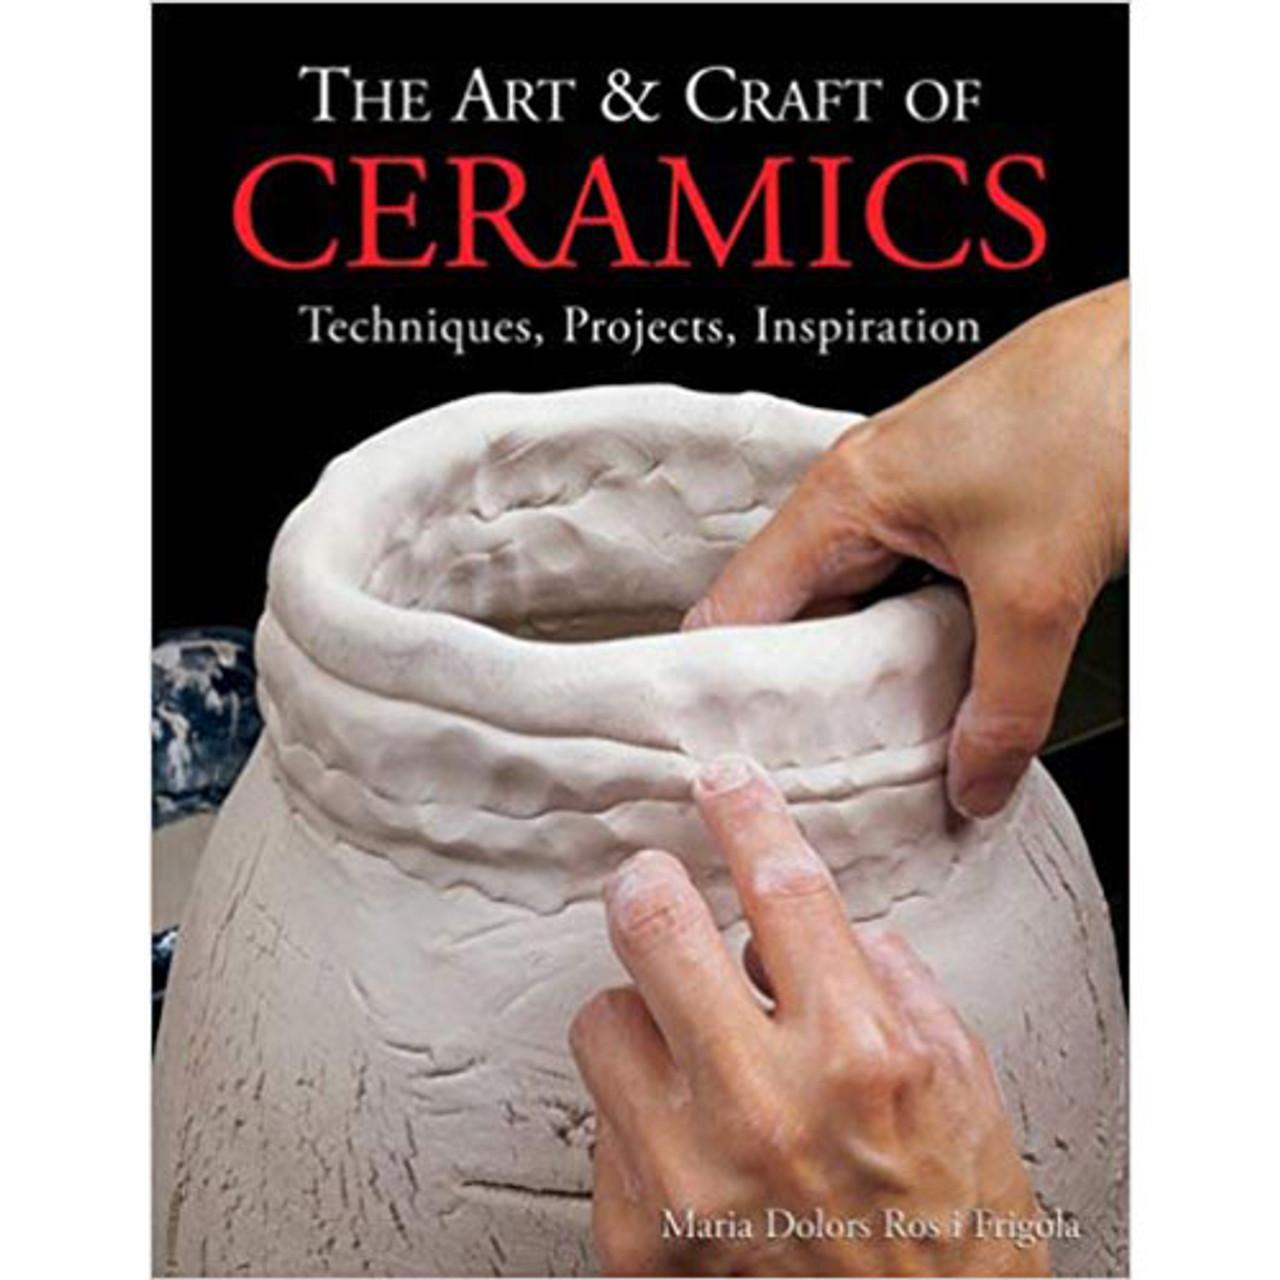 The Art & Craft of Ceramics: Techniques, Projects, Inspiration by Maria Dolors Ros i Frigola